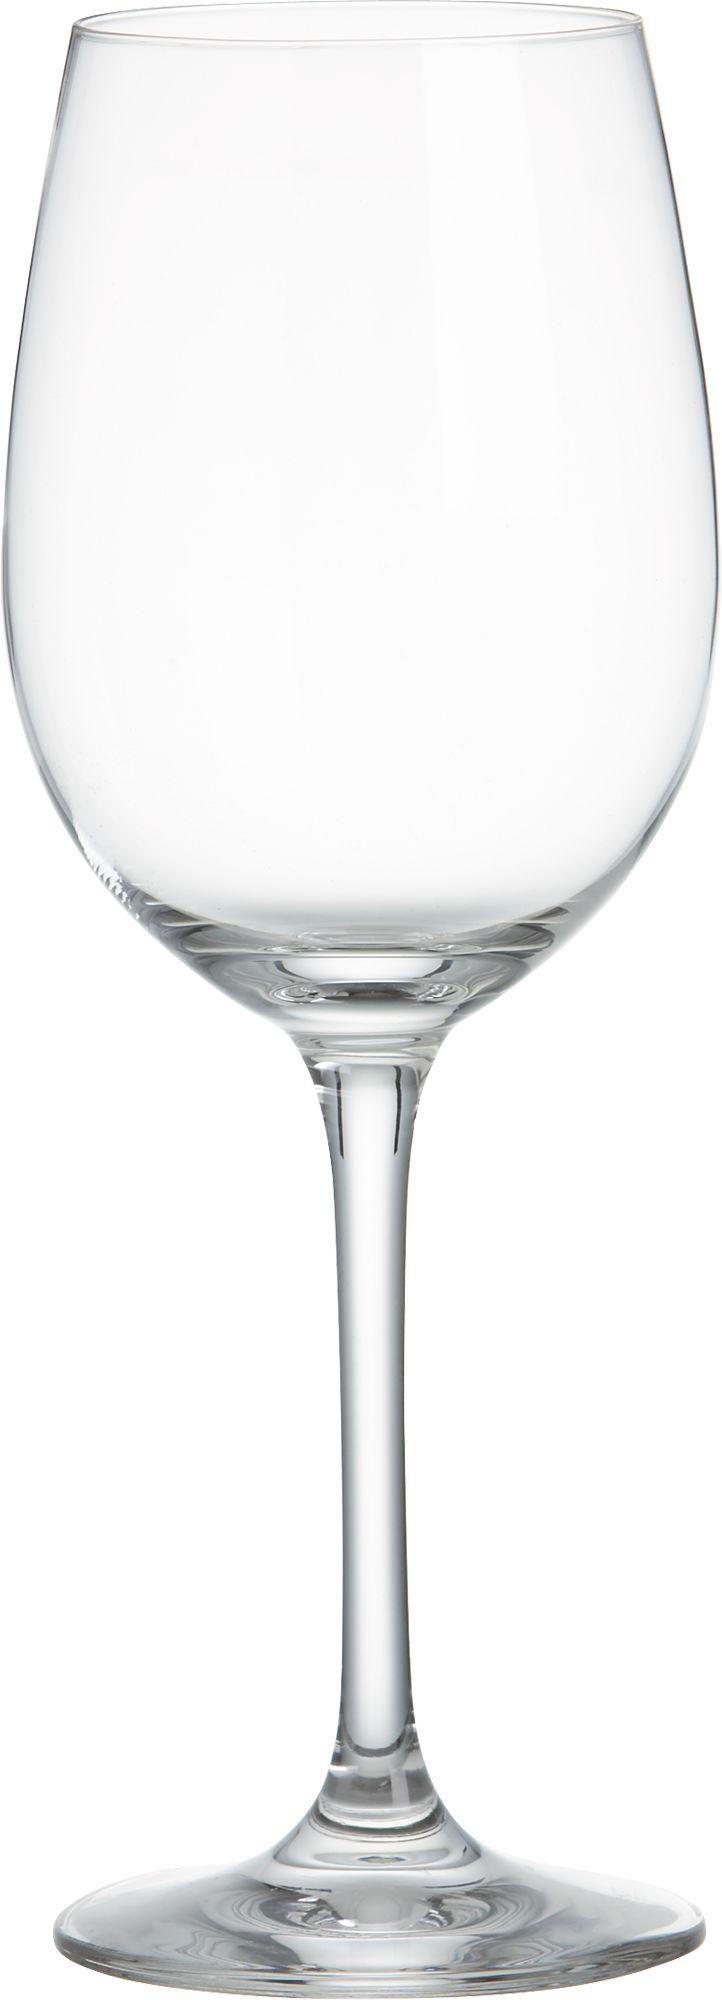 Oversized, all-purpose wine glass is crafted in Germany of lead-free Tritan® glass with the brilliance of crystal.<br /><br /><NEWTAG/><ul><li>Tritan® glass</li><li>Hand wash</li></ul>